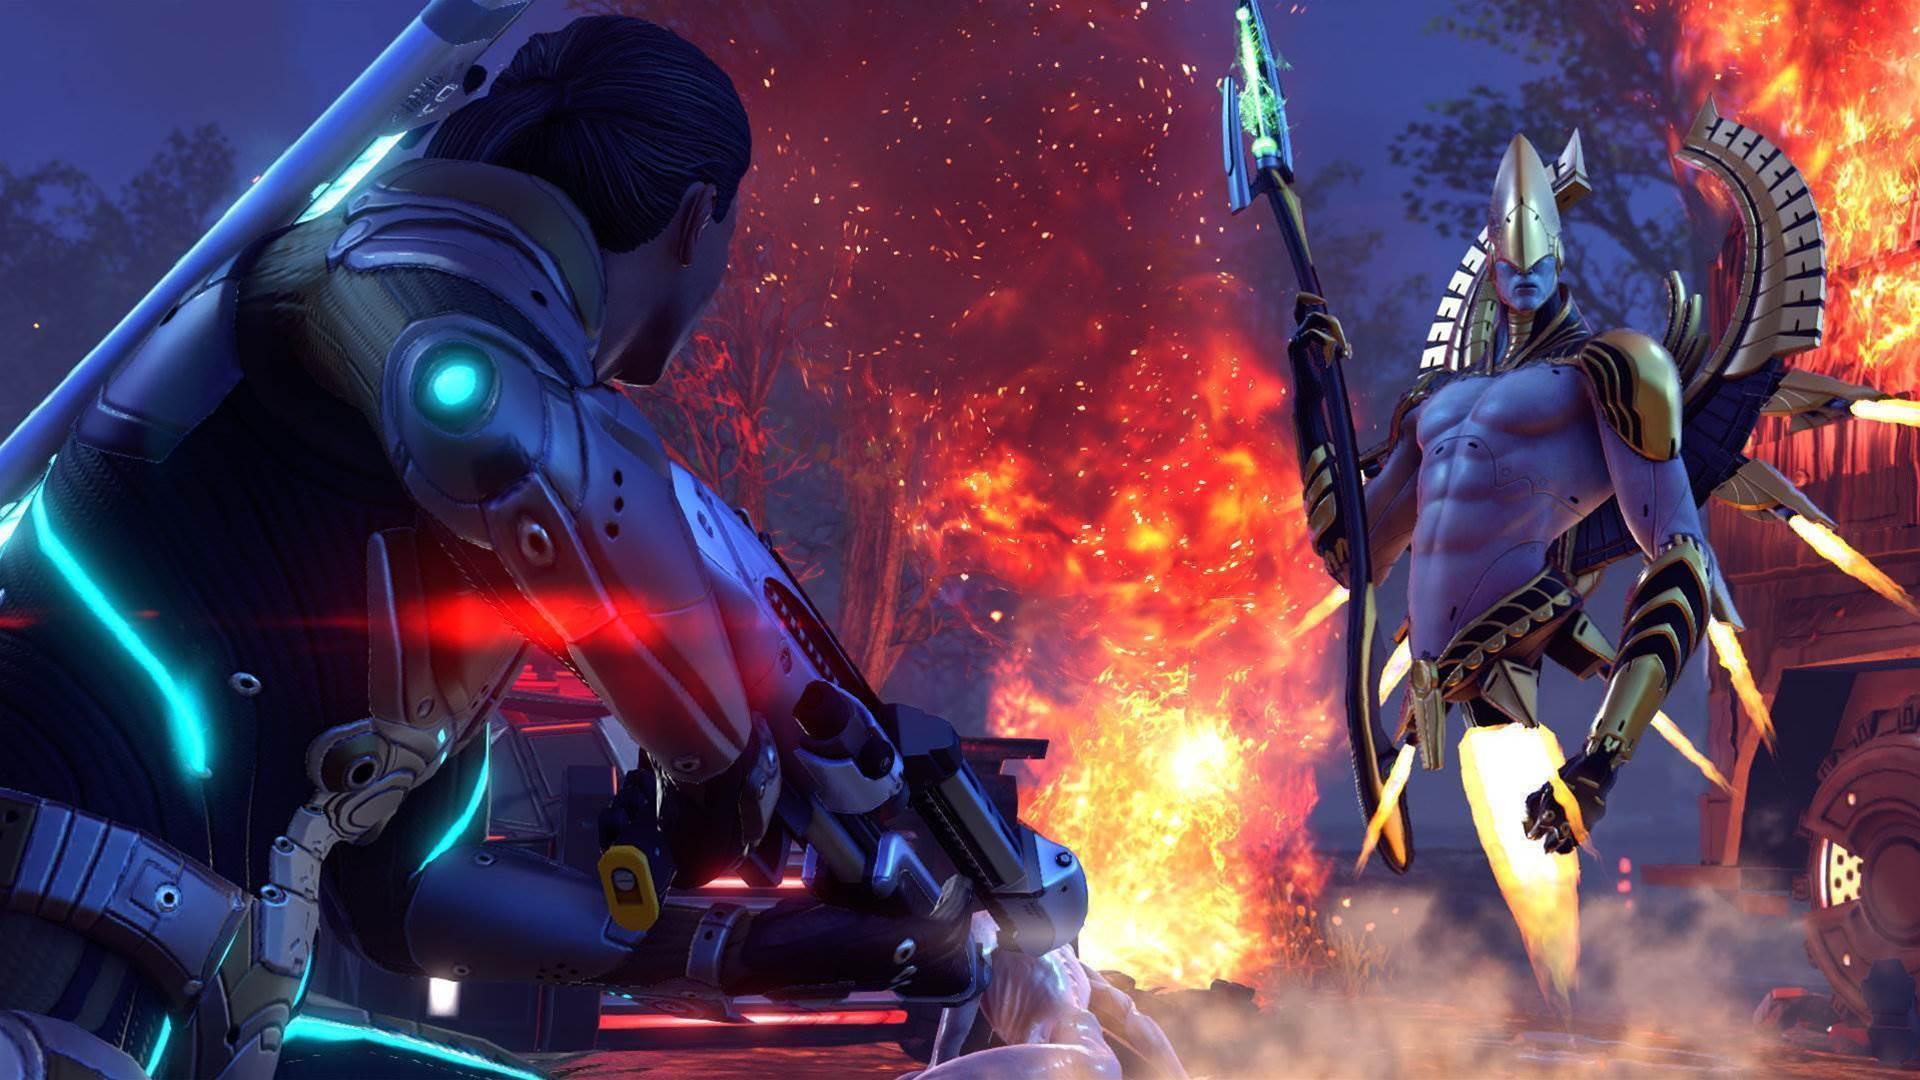 PlayStation Plus June games include XCom 2, Trials Fusion